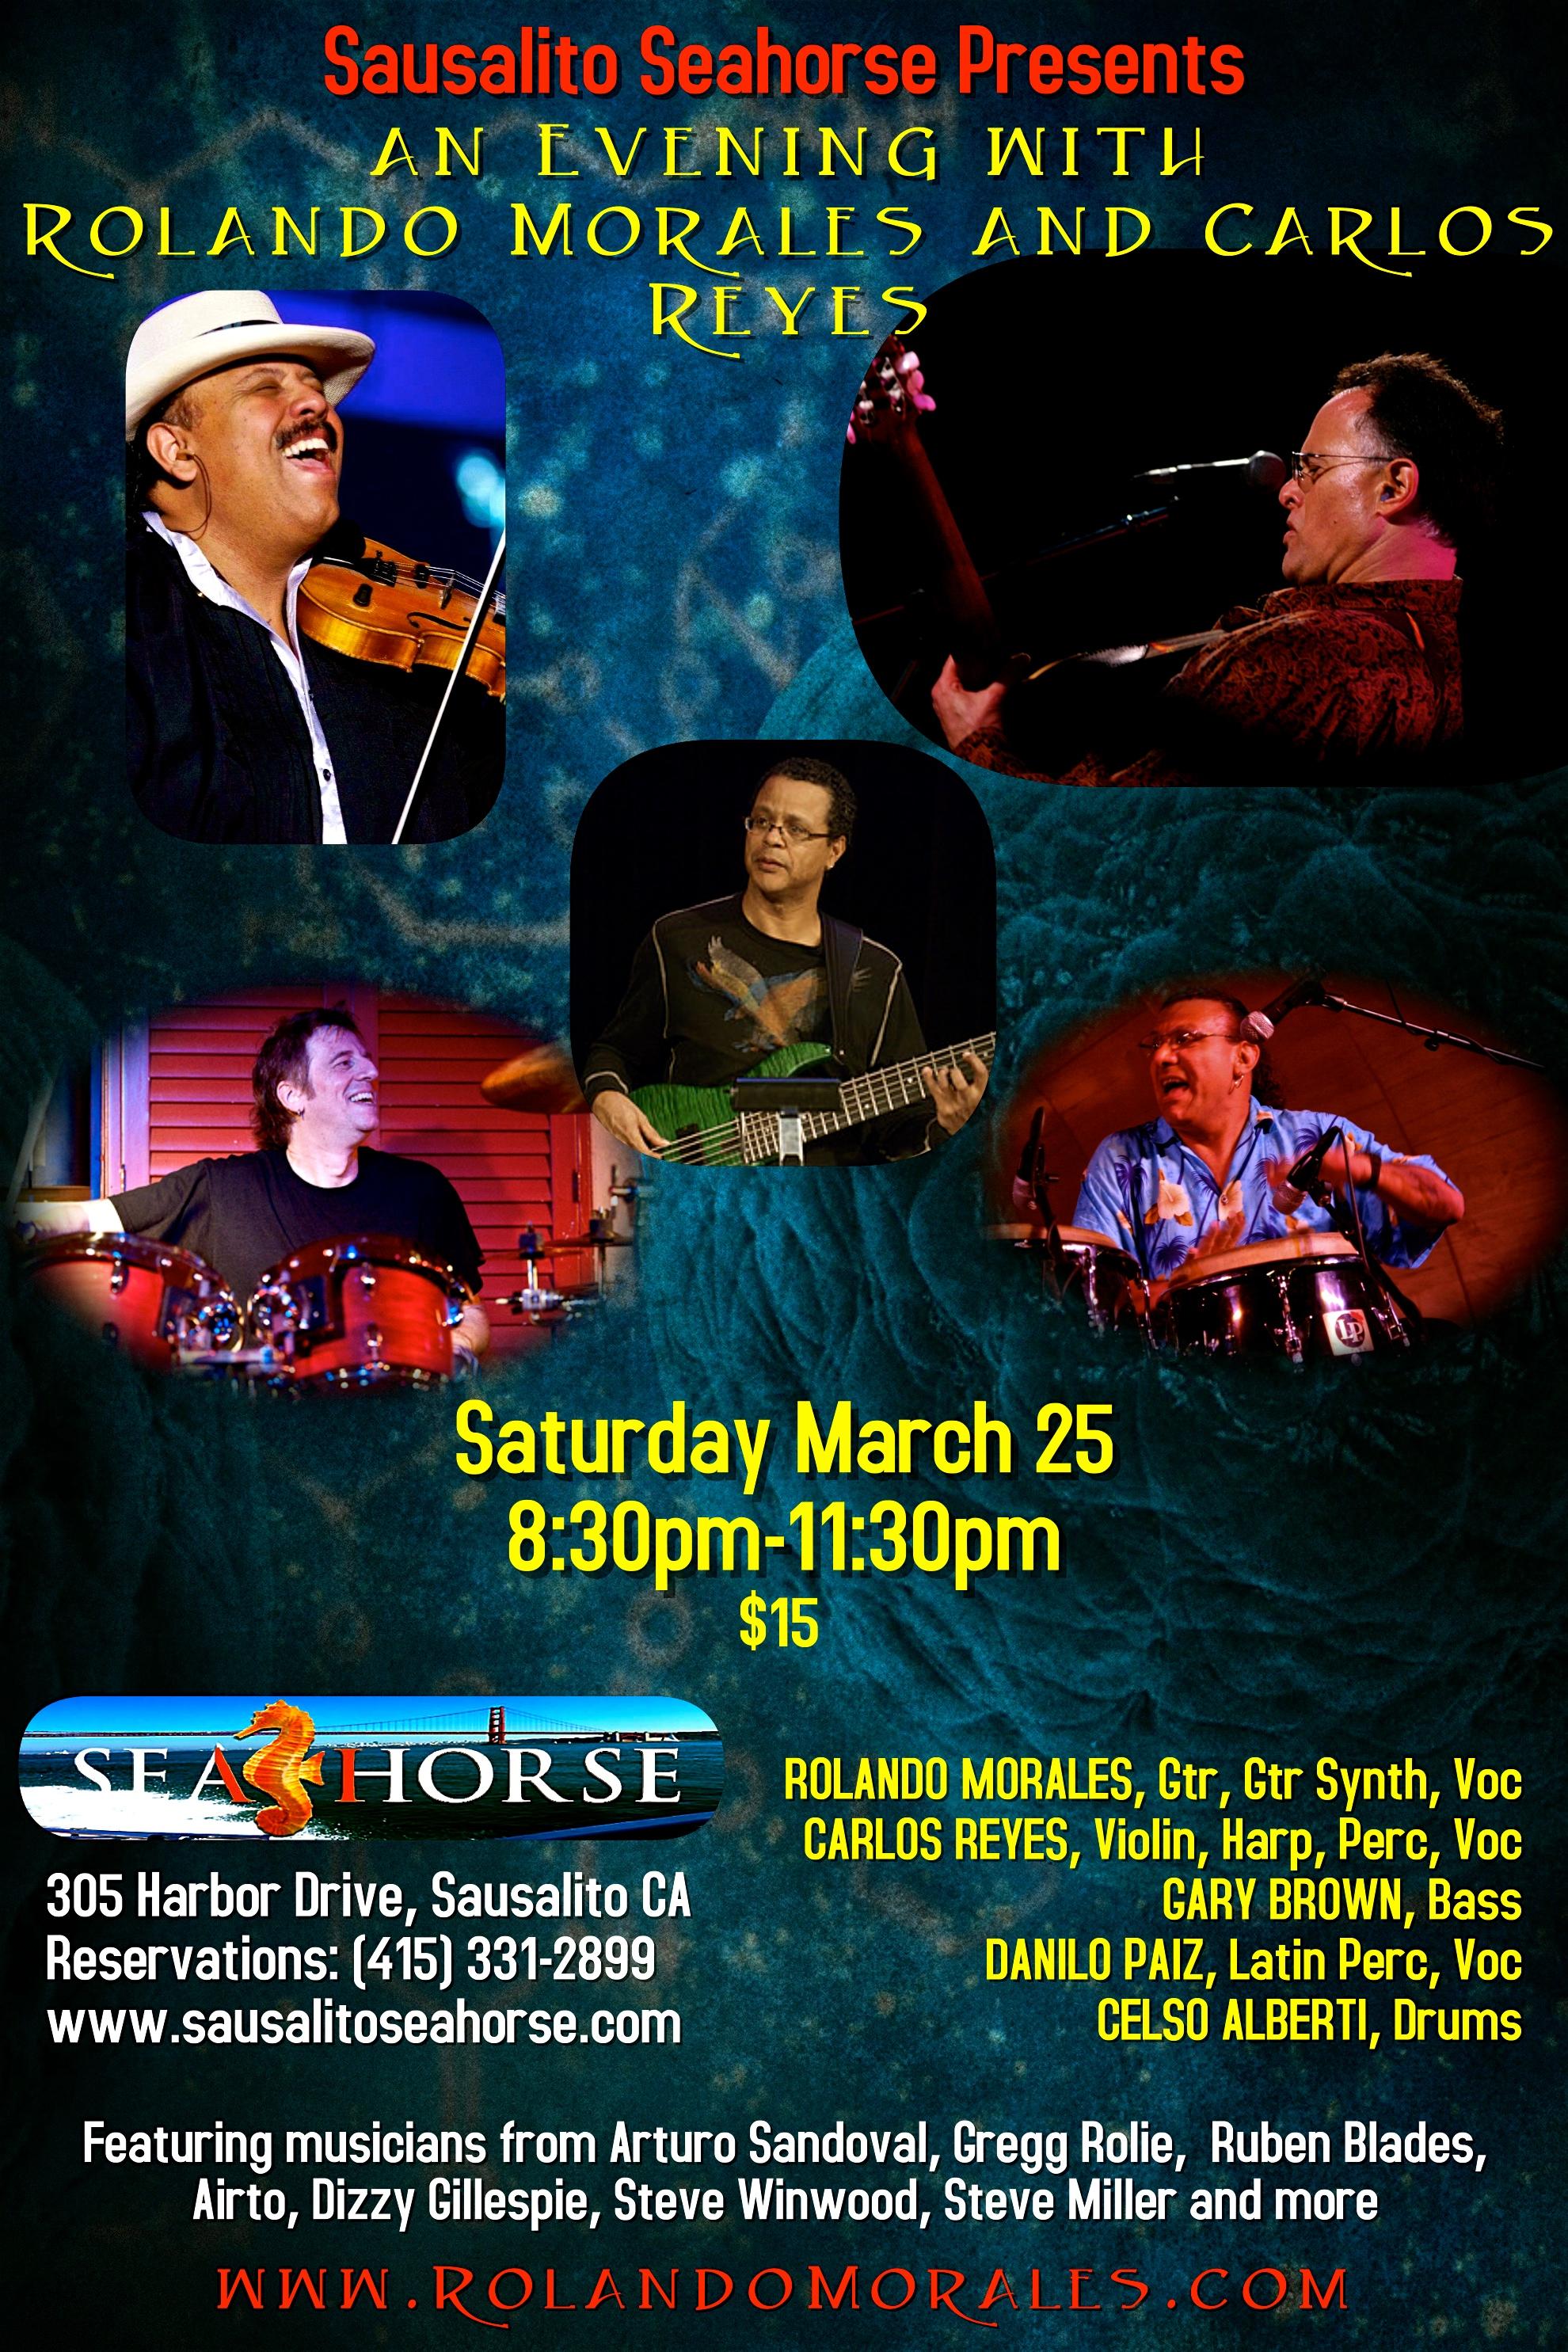 Full Rolando Morales Band will perform at Sausalito Seahorse March 25, 2017